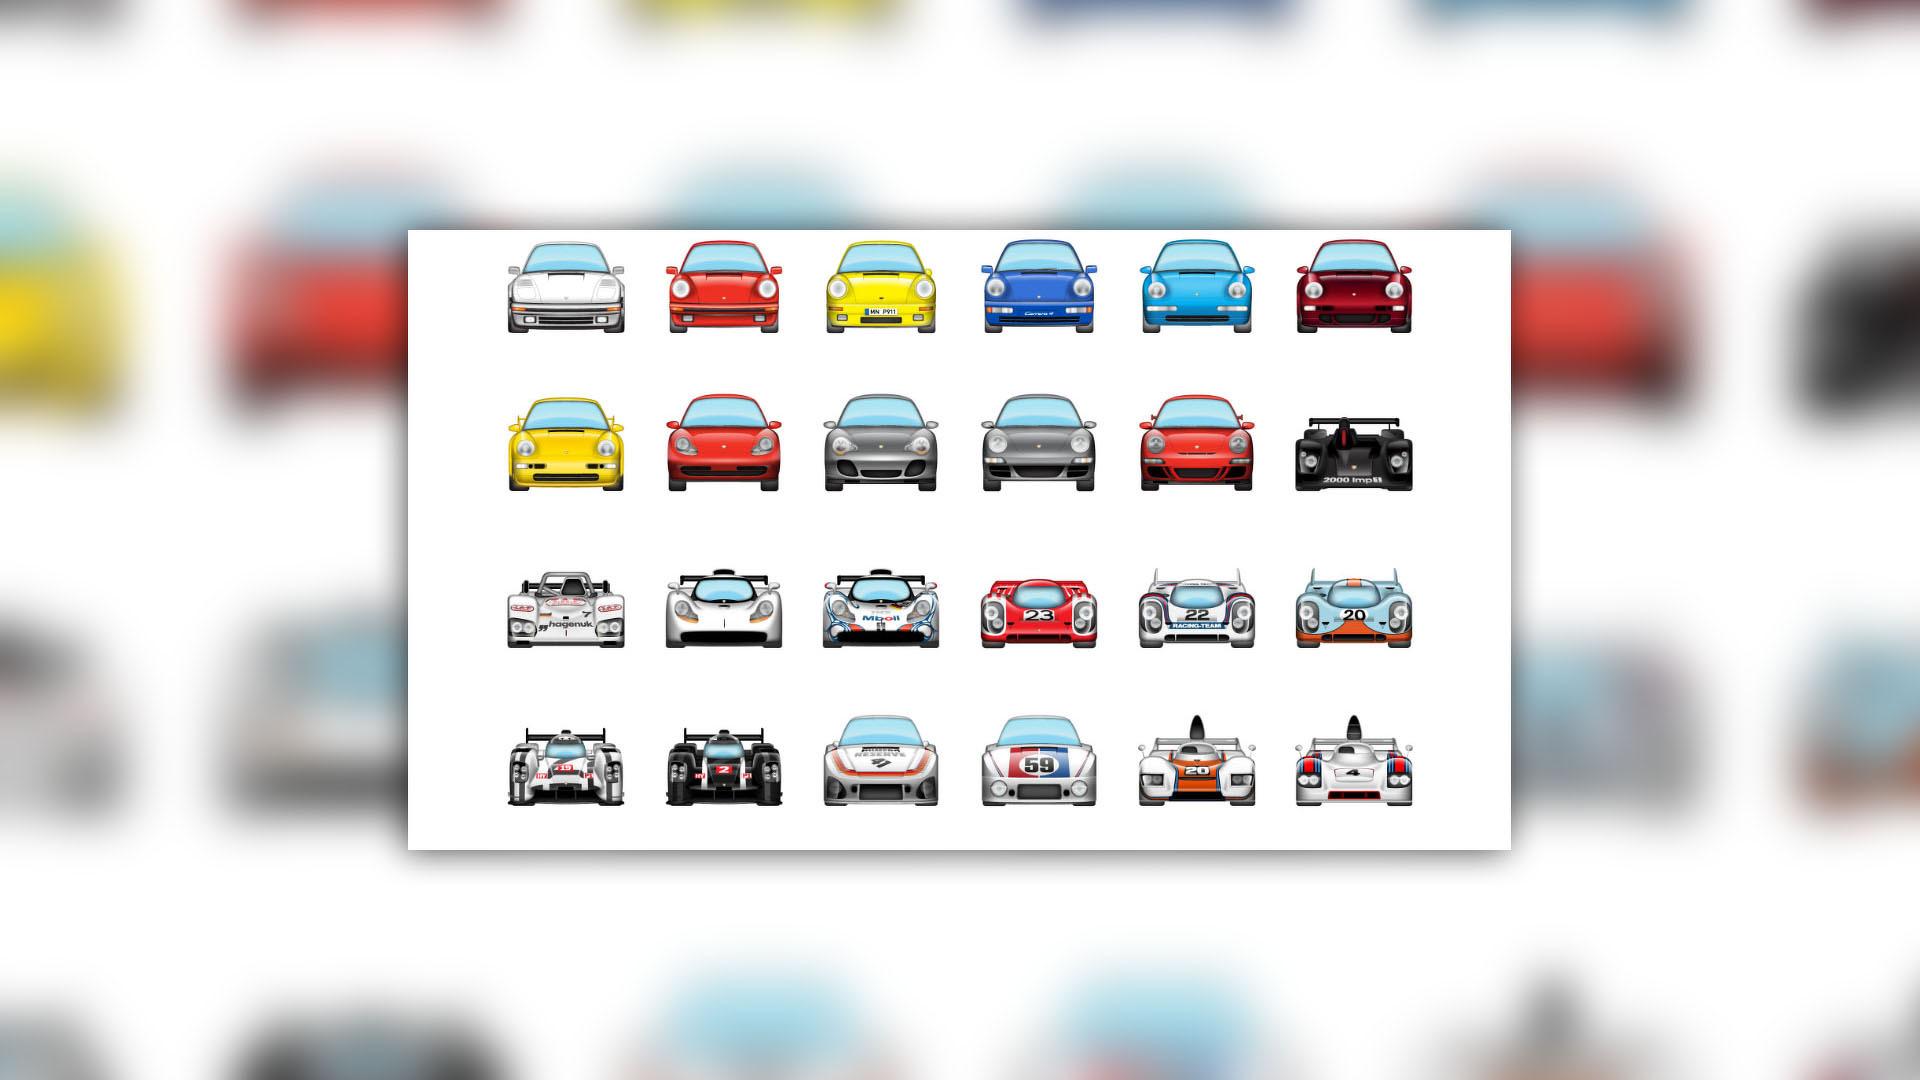 Porsche emoji pack makes iPhone texting way more fun